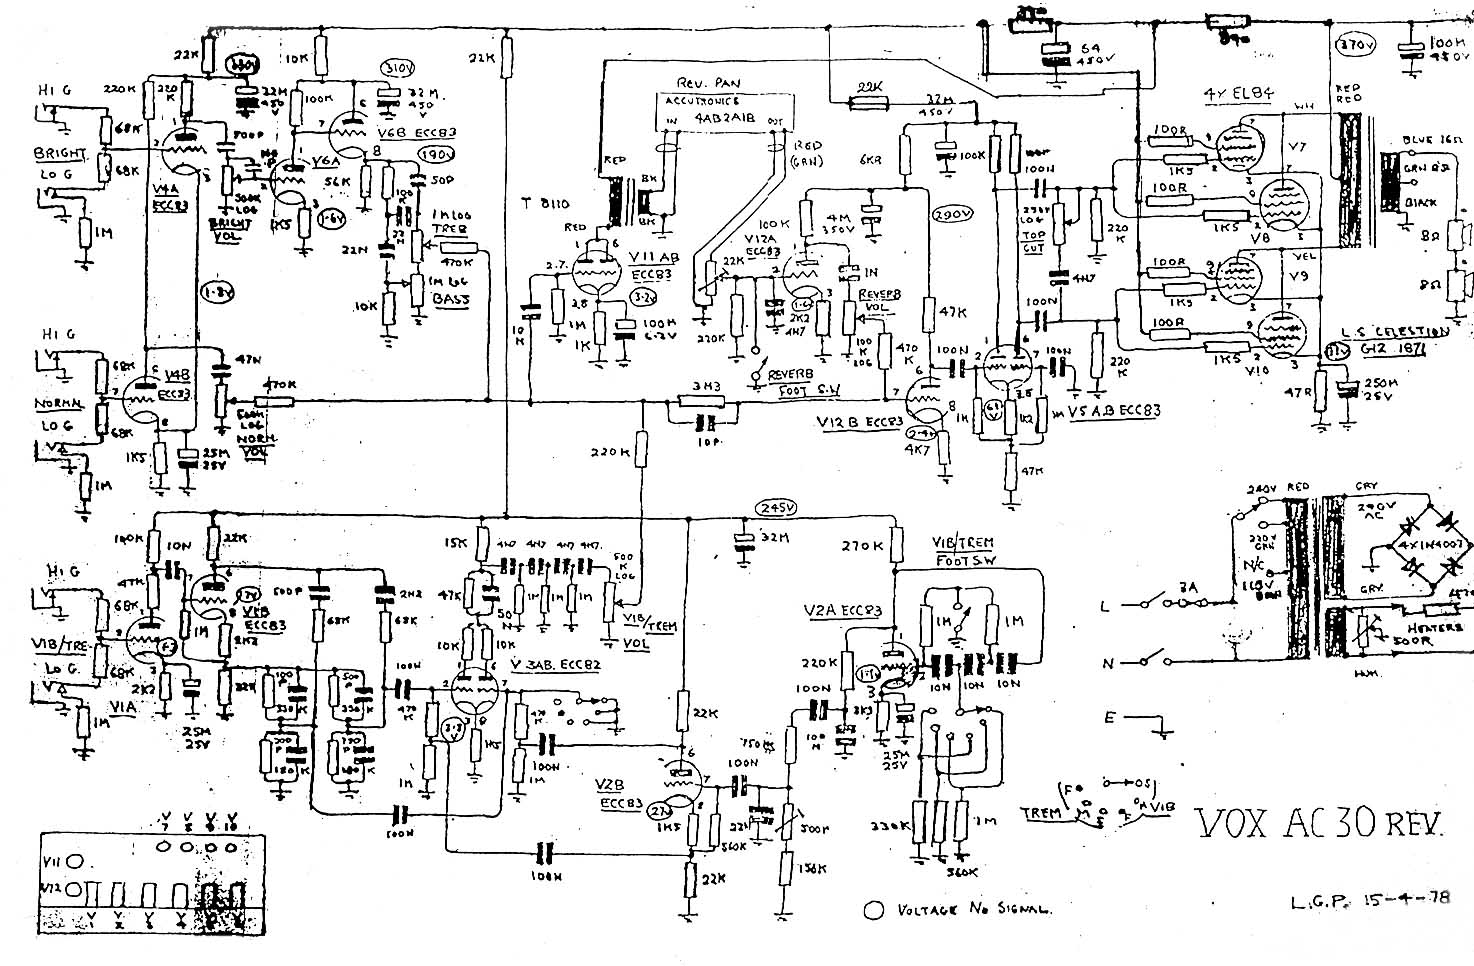 amp diagram vox vintage circuit diagrams amp wiring diagram